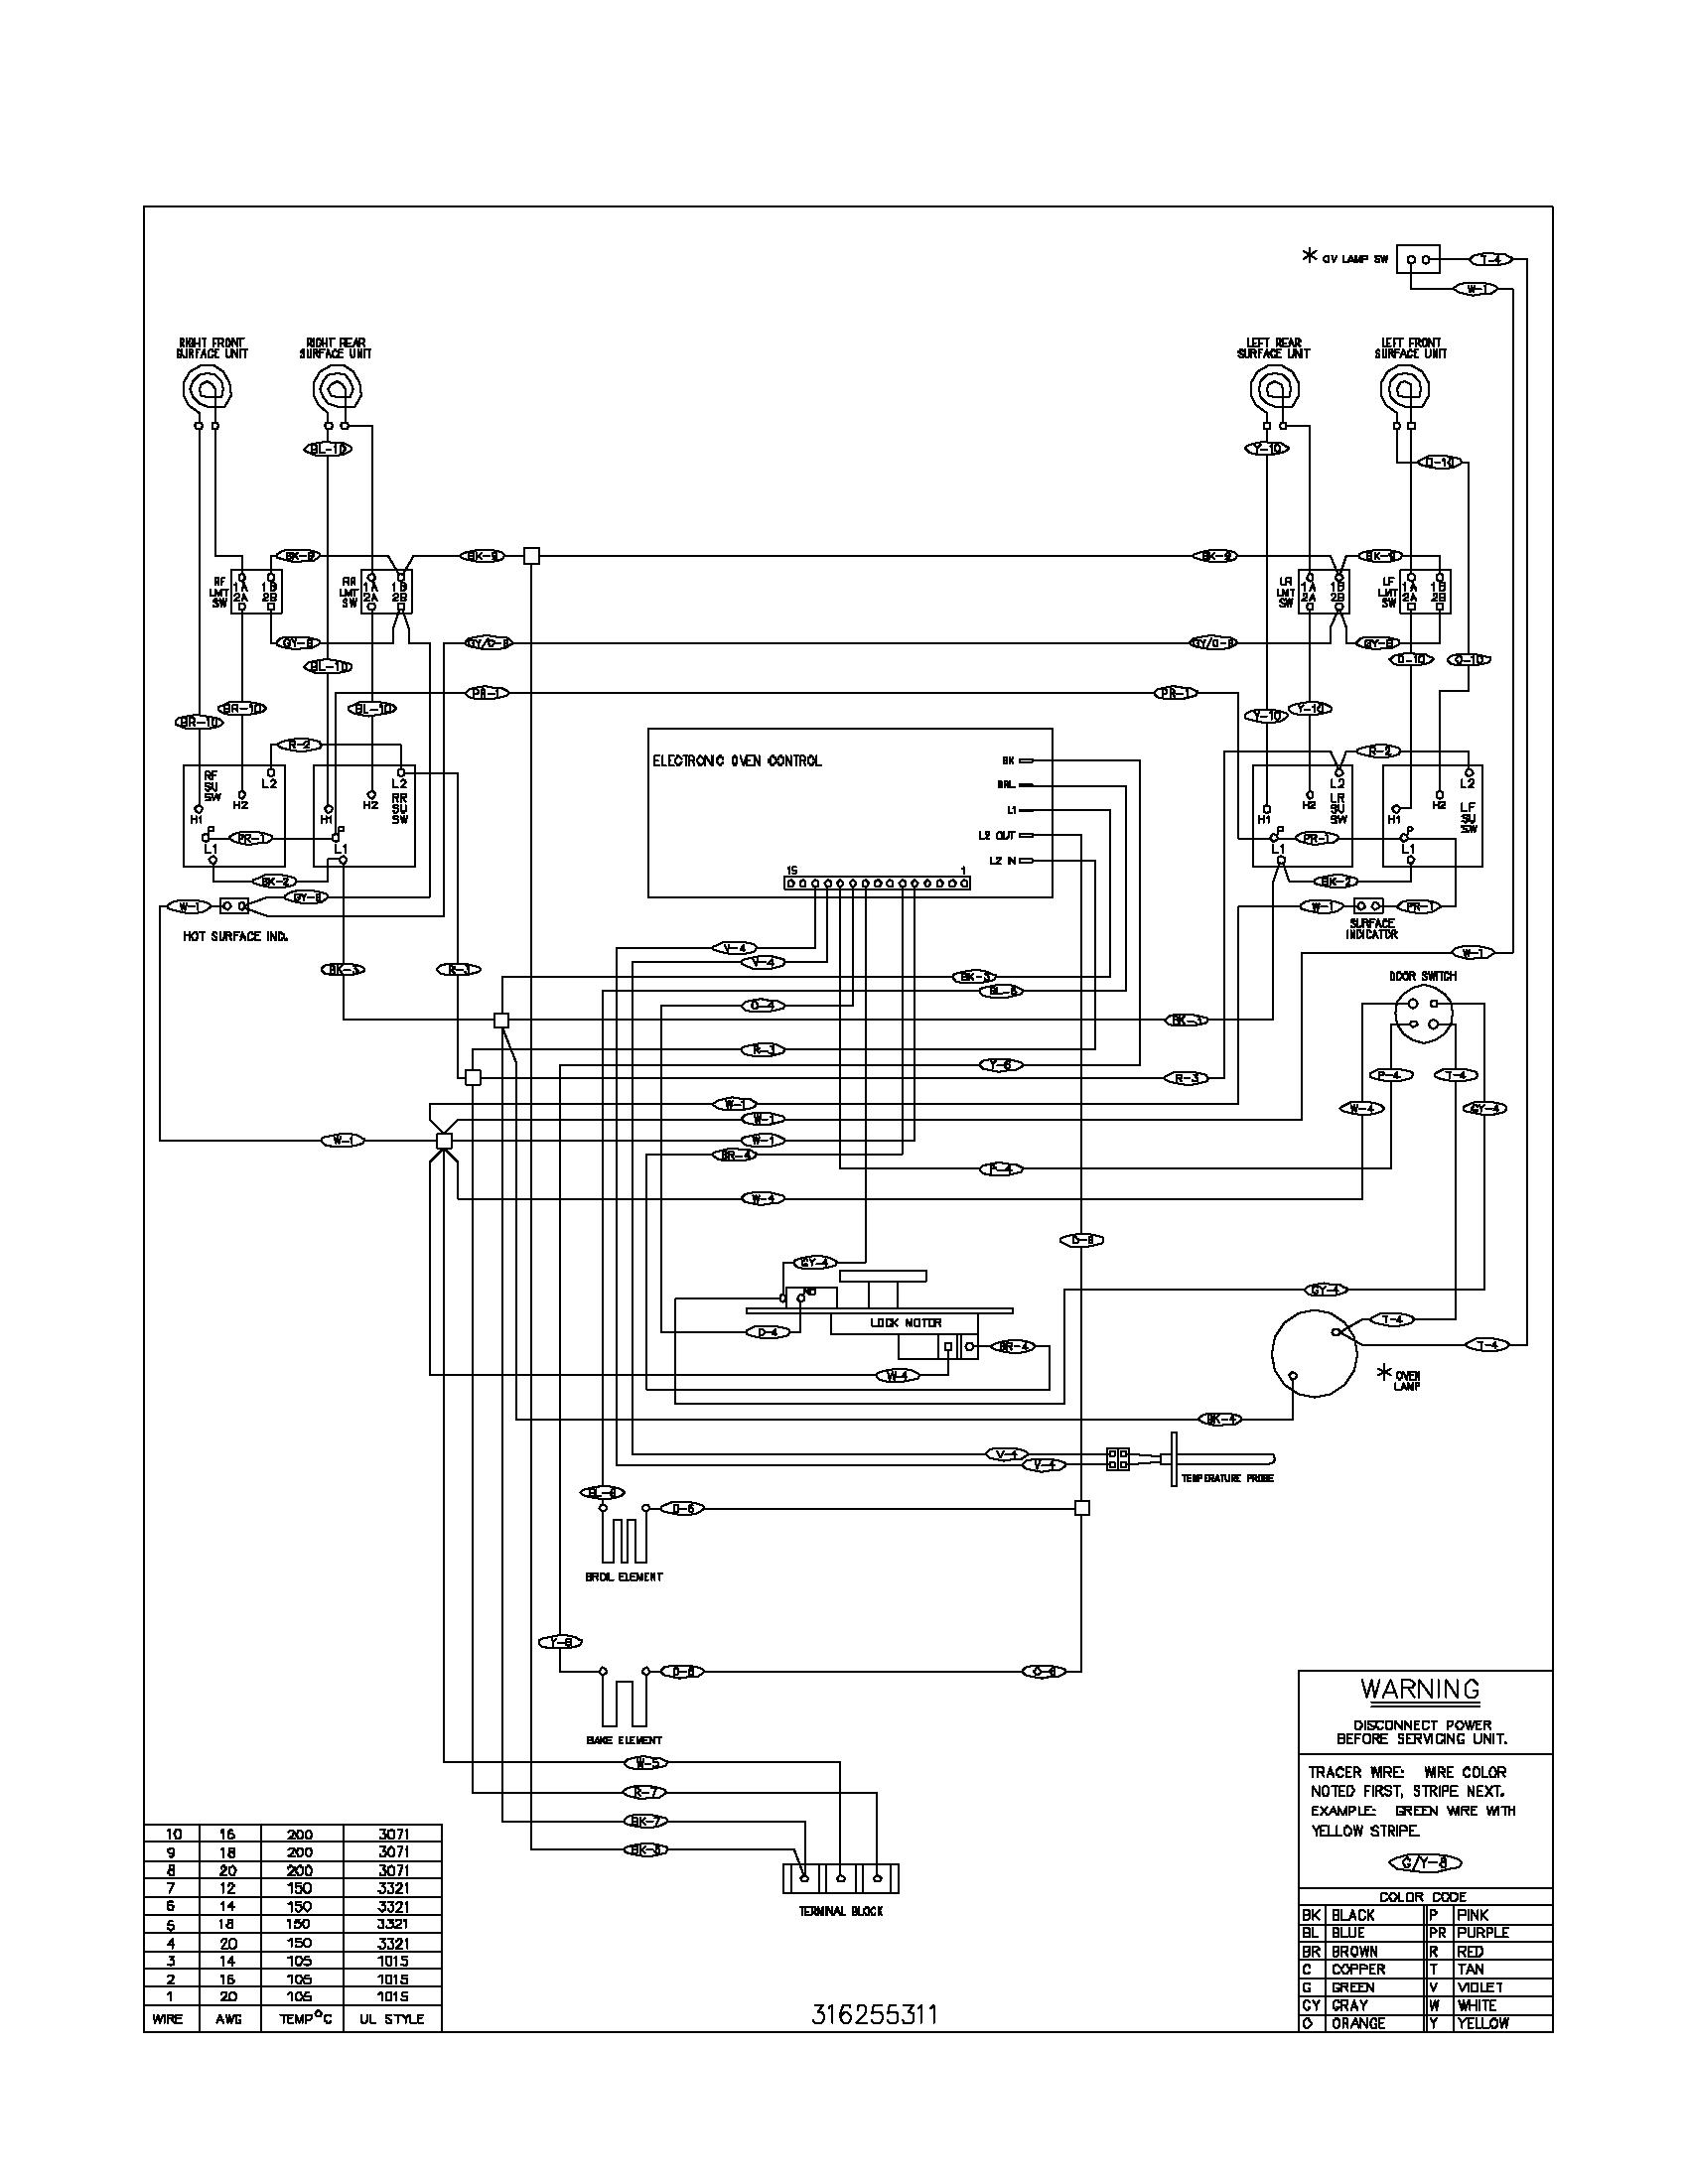 [SCHEMATICS_4JK]  EH_2688] Electric Stove Wiring Diagram On Wiring Diagram For Electric Stove | Viking Stove Wiring Diagram |  | Phil Benkeme Mohammedshrine Librar Wiring 101